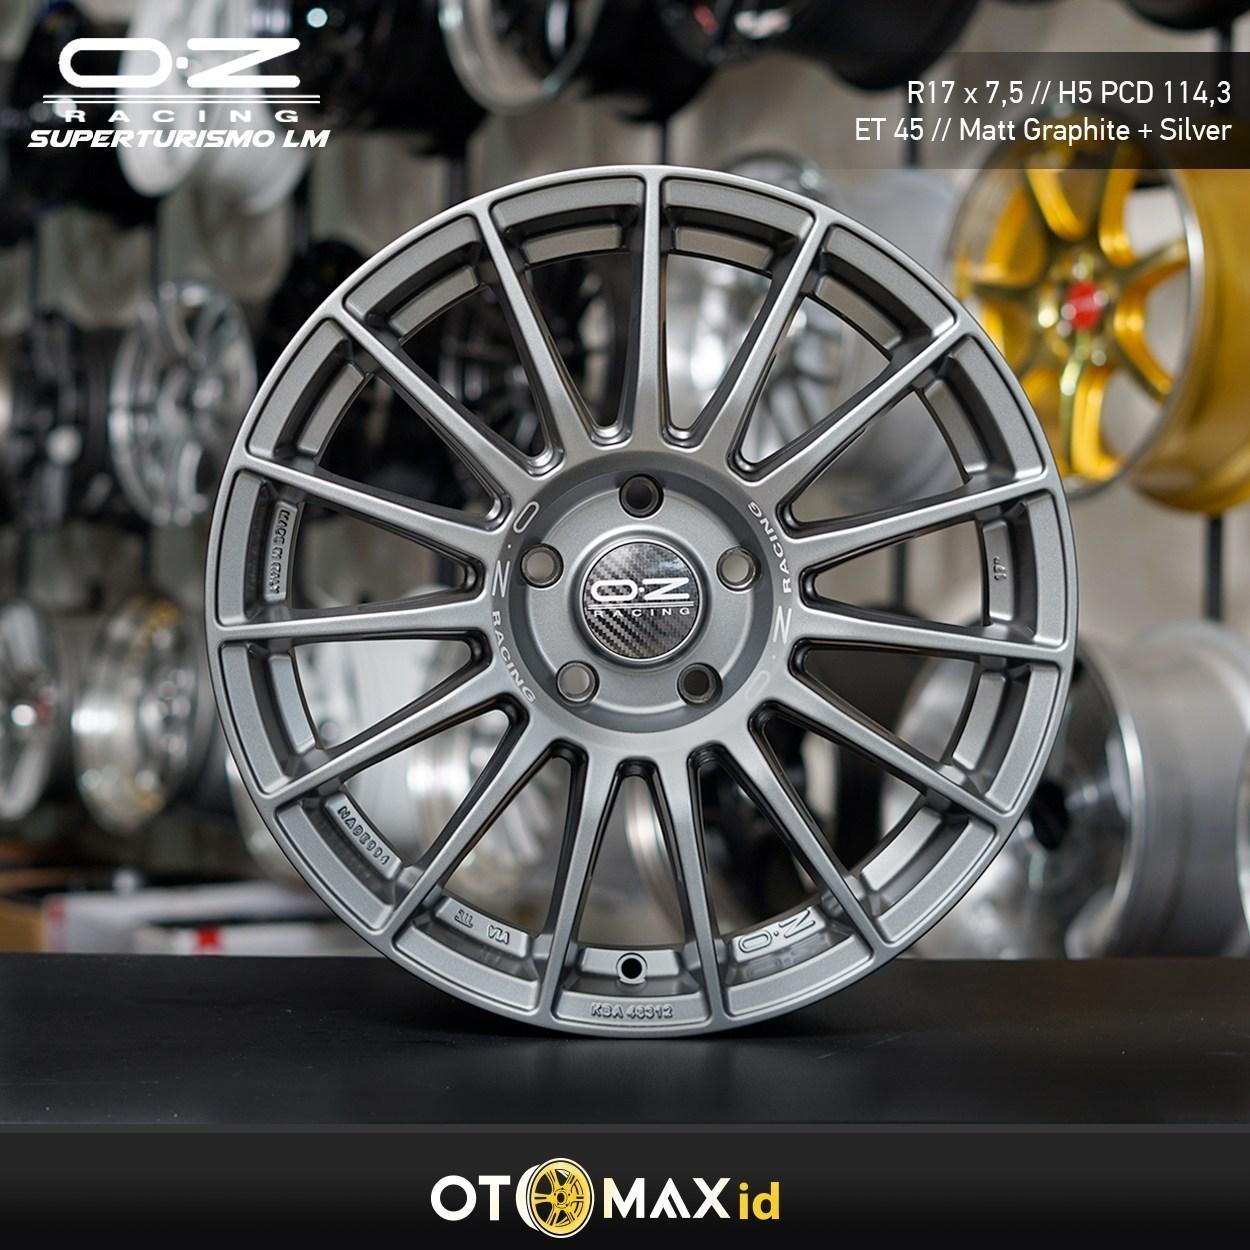 Velg Mobil OZ Racing Super Turismo LM Ring 17 Matt Graphite+Silver Lettering OZ